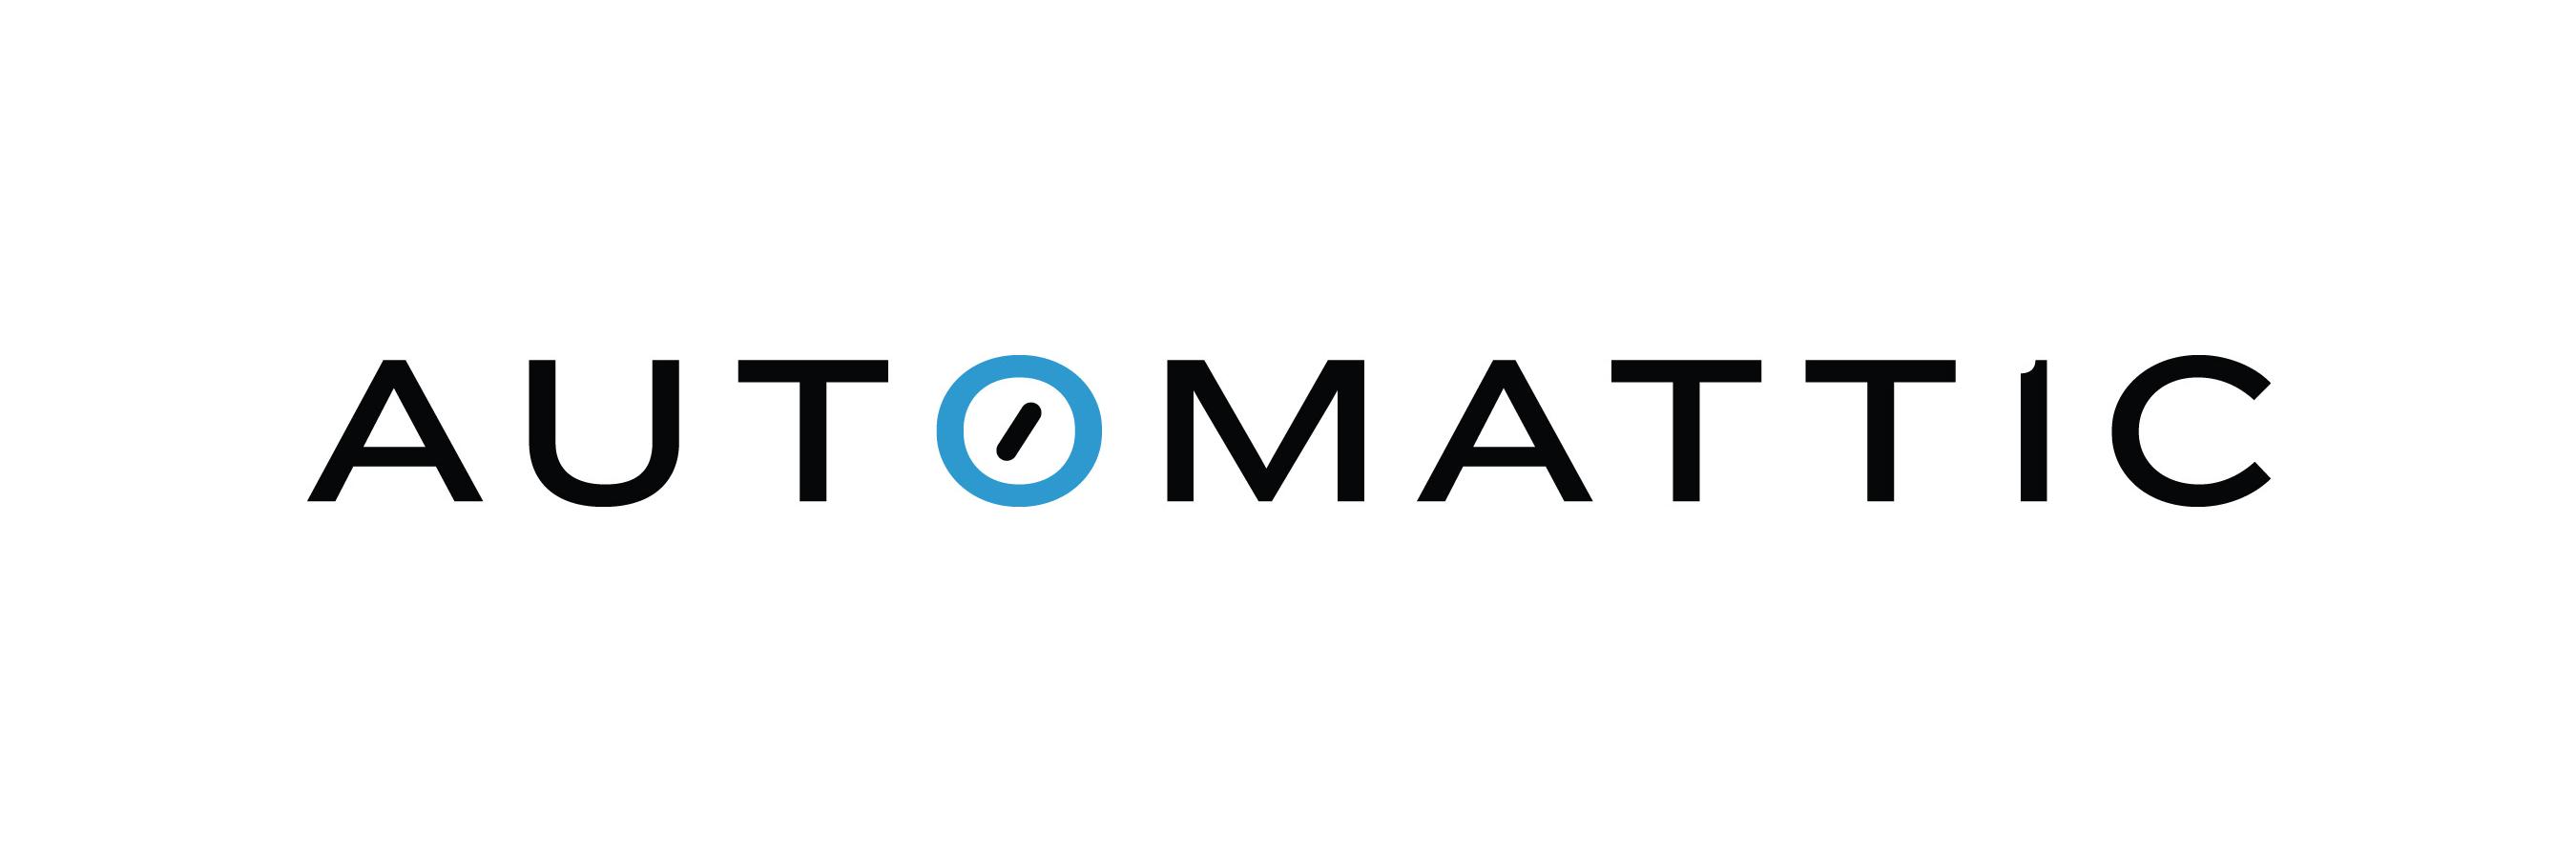 Automattic company logo